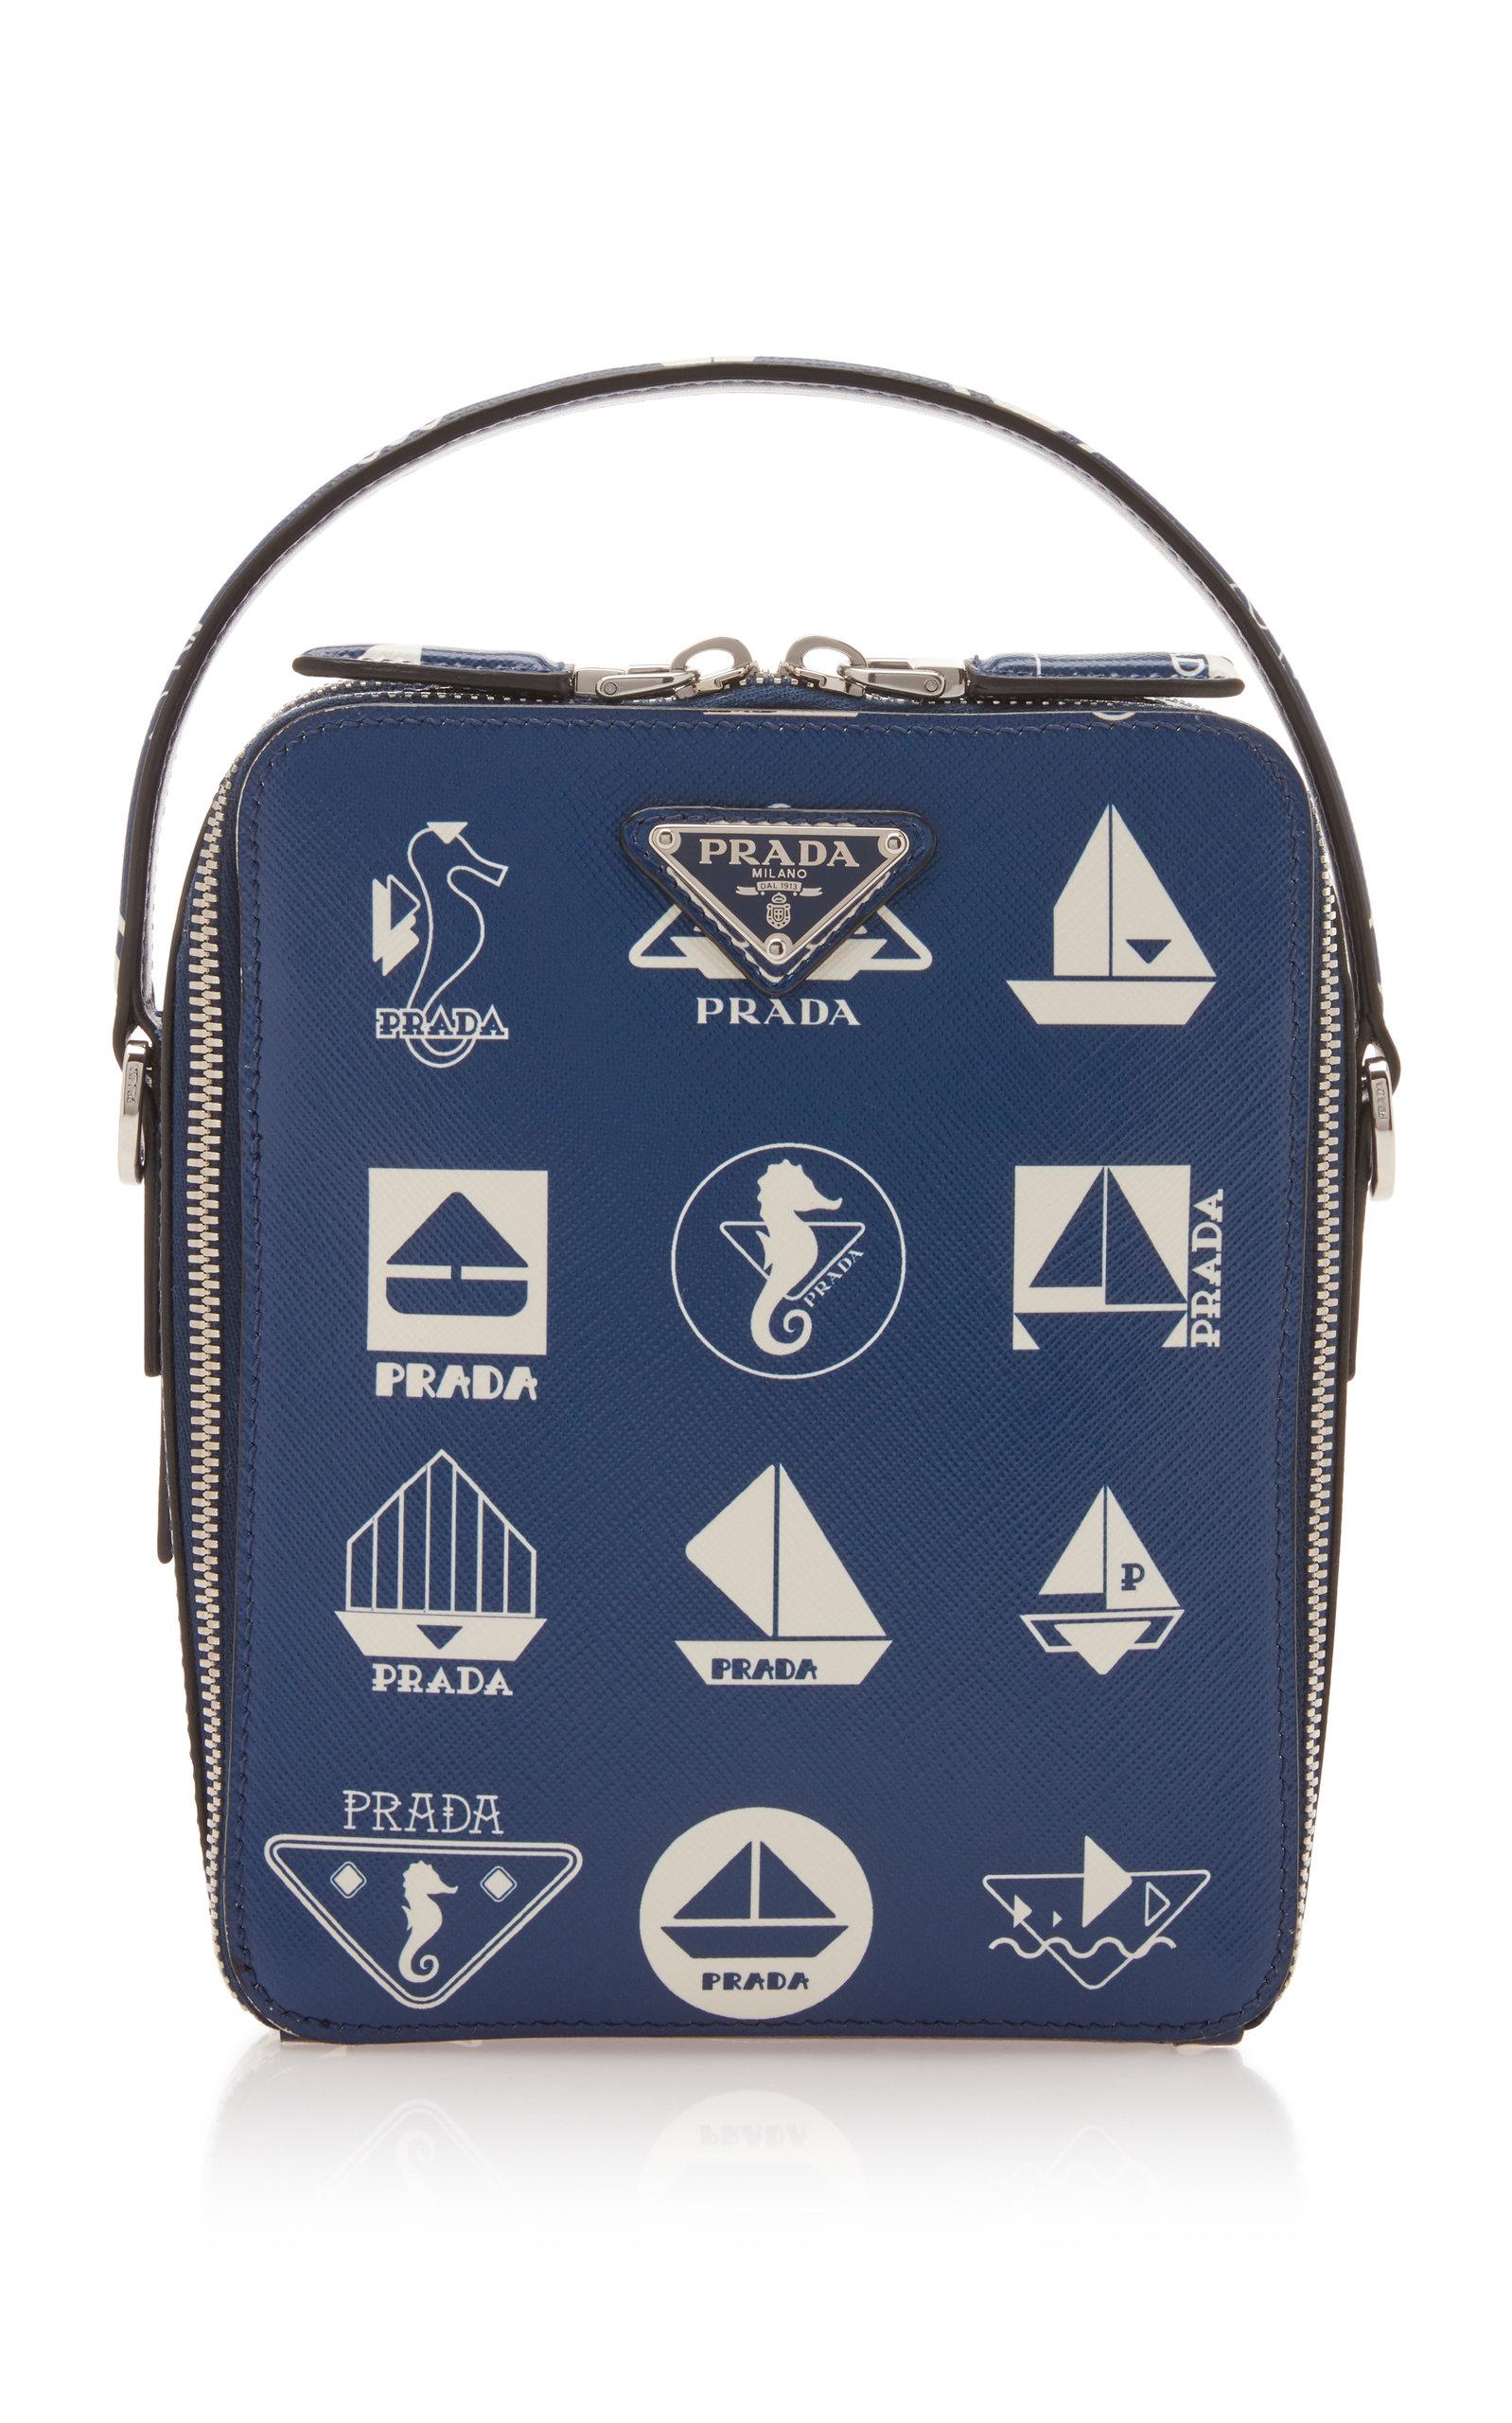 Prada Nautical Leather Crossbody Bag In Blue